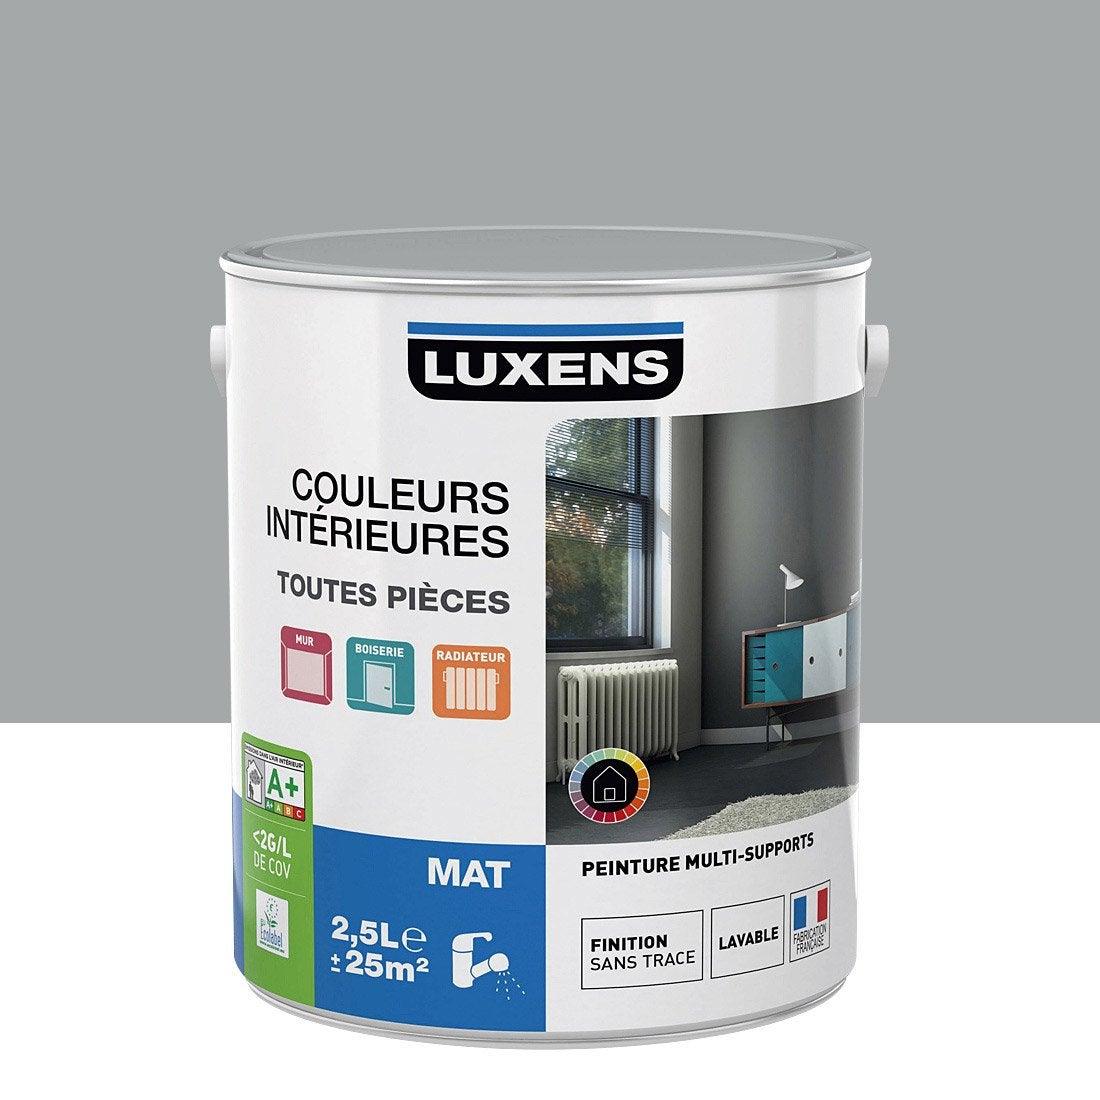 Peinture gris galet 4 luxens couleurs int rieures mat 2 5 - Peinture leroy merlin luxens ...